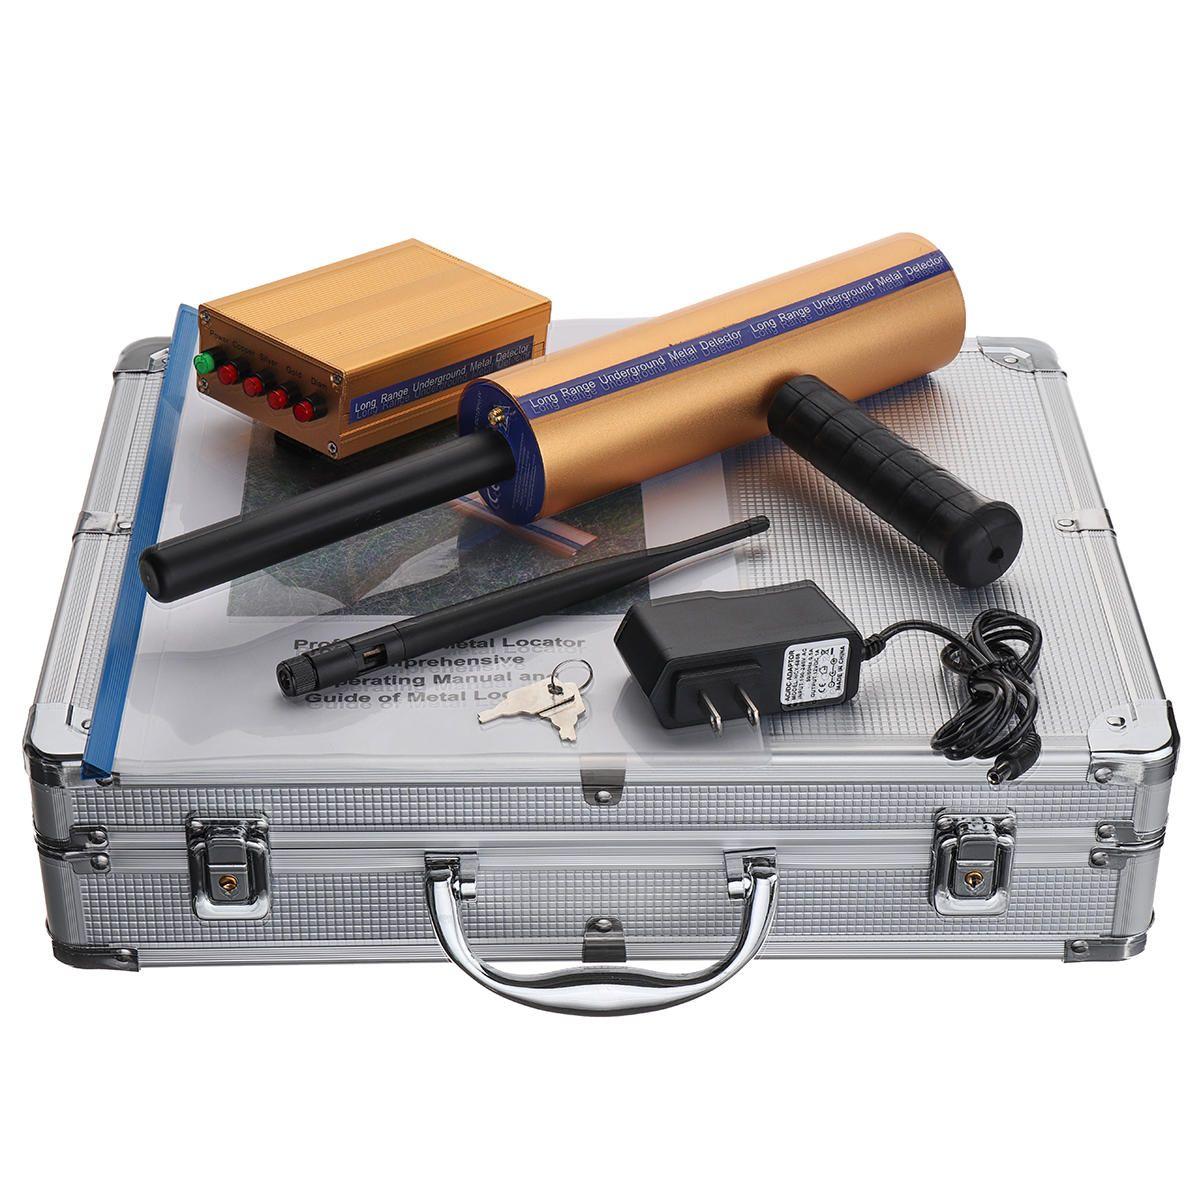 US$159 99] AKS Hand-held Metal Detector Locator with